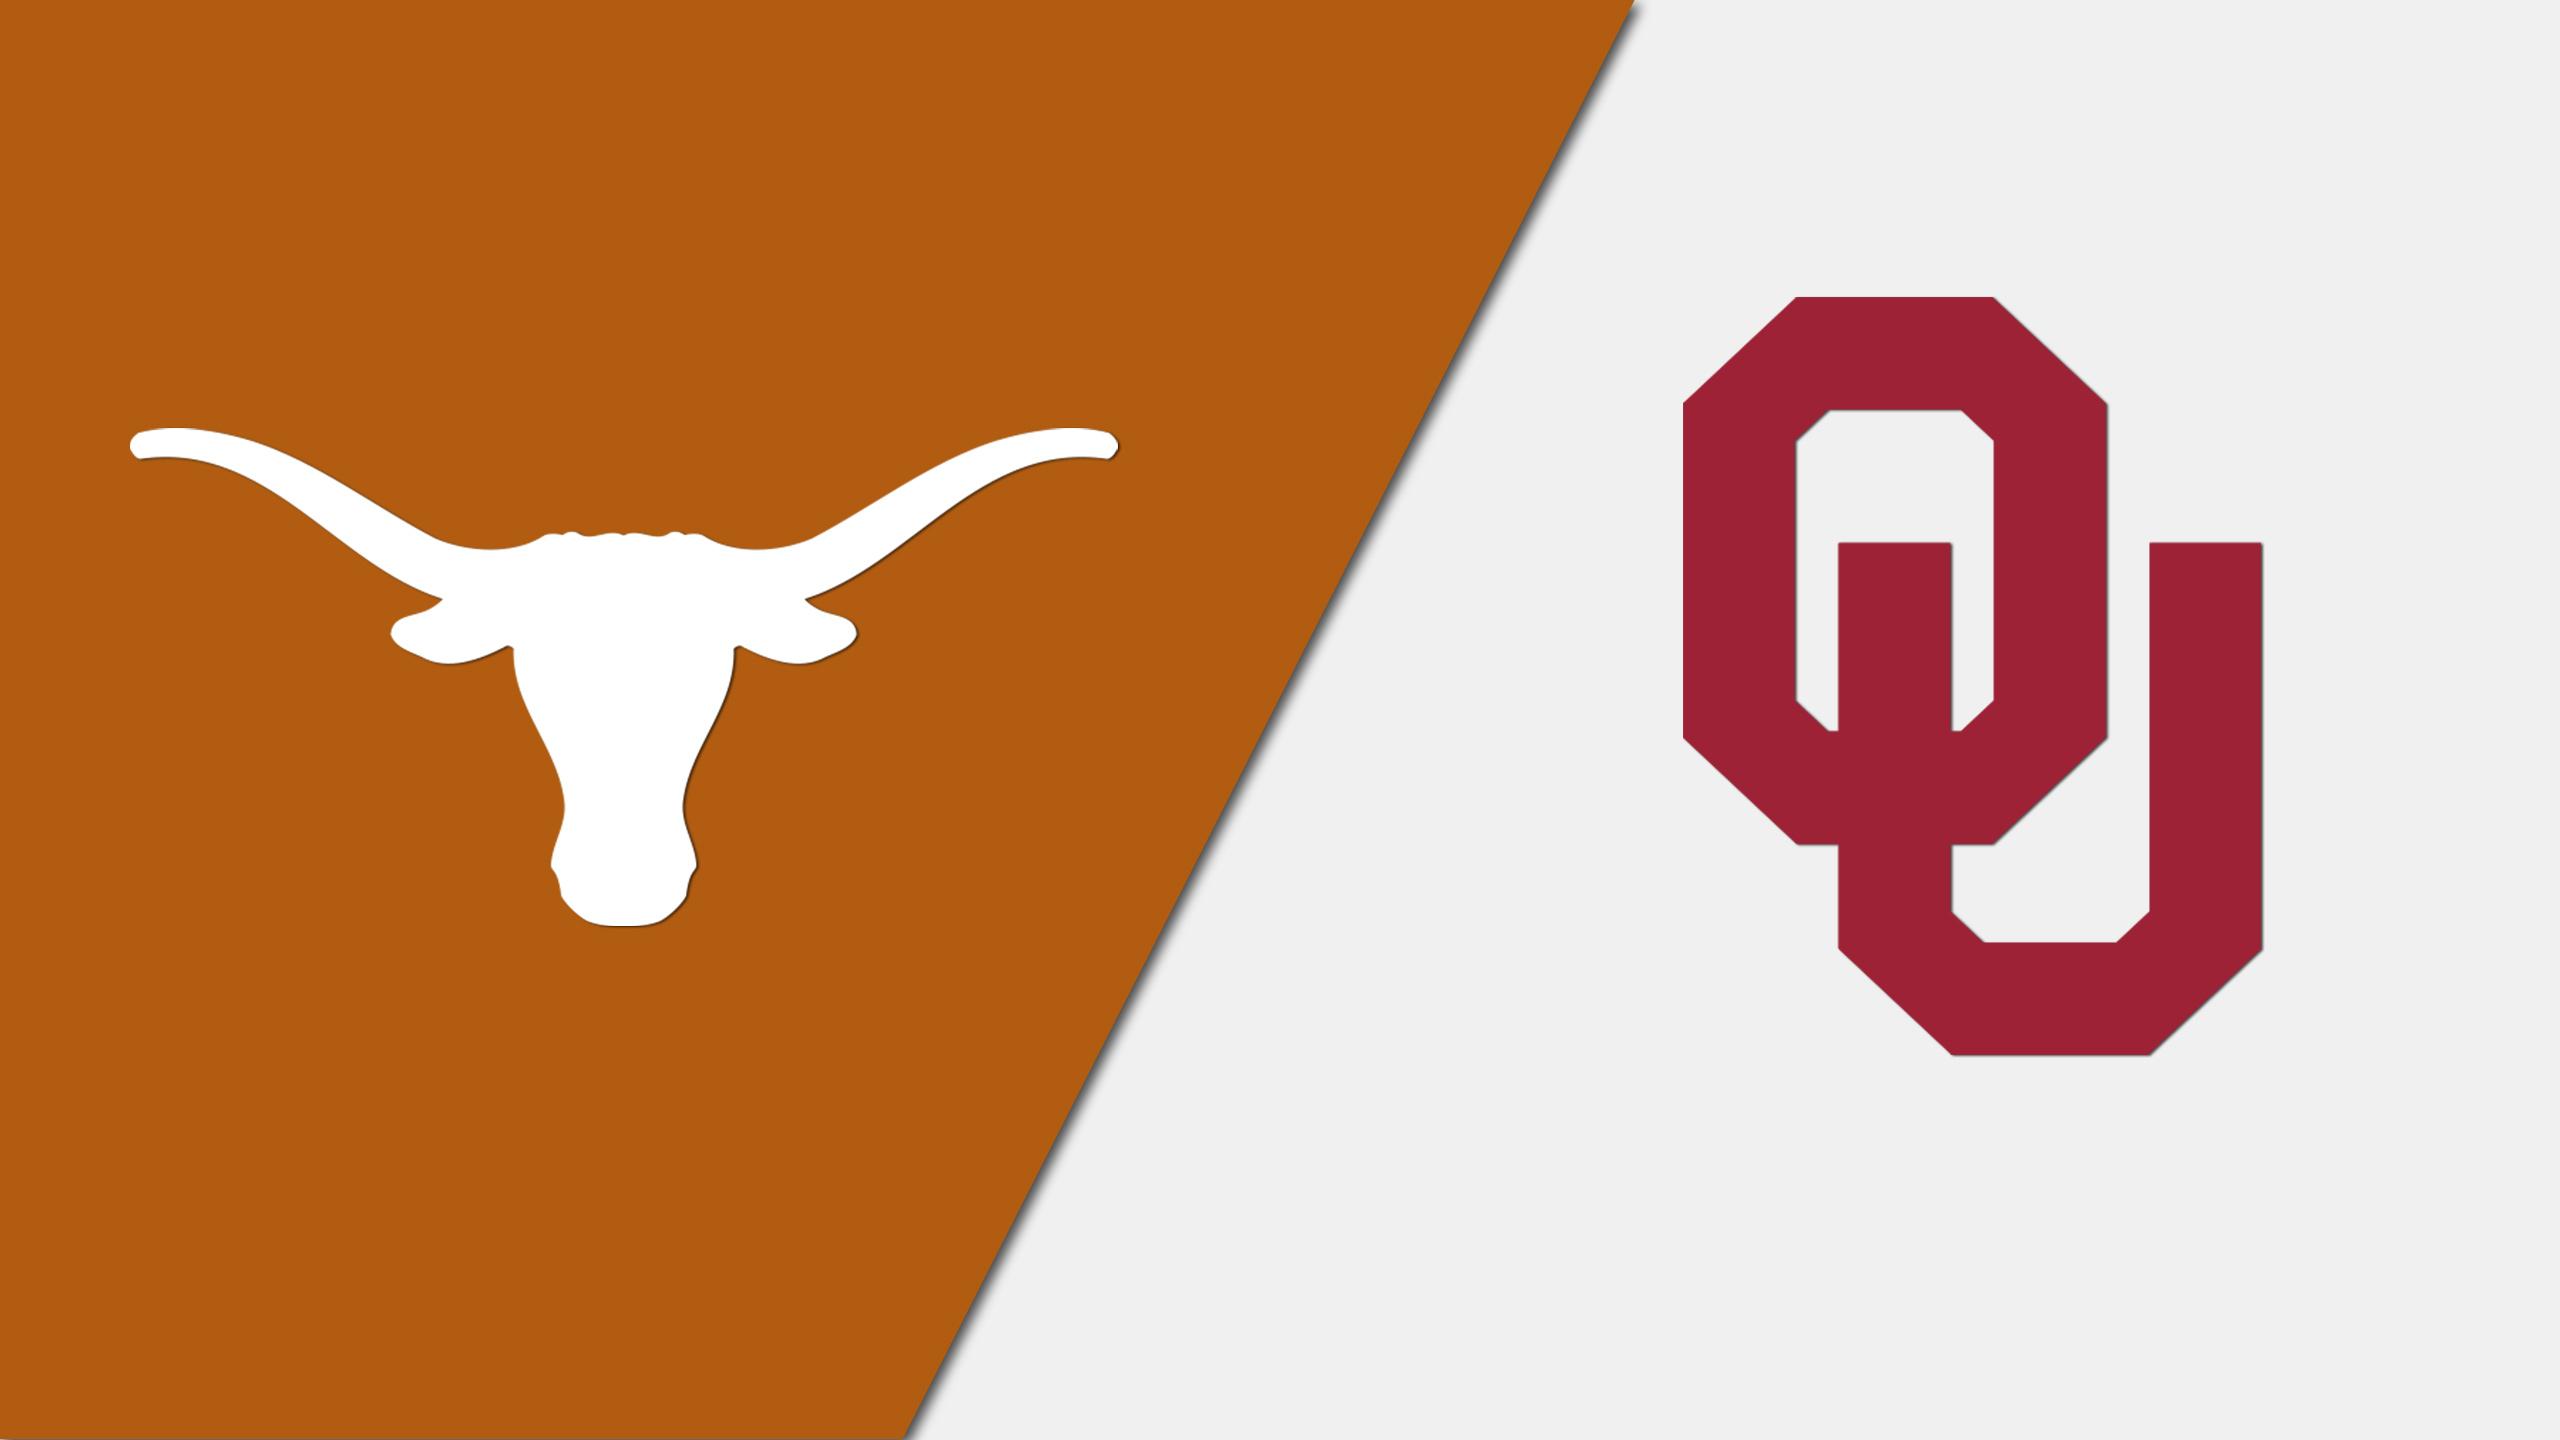 Texas Longhorns vs. Oklahoma Sooners - 10/9/1999 (re-air)